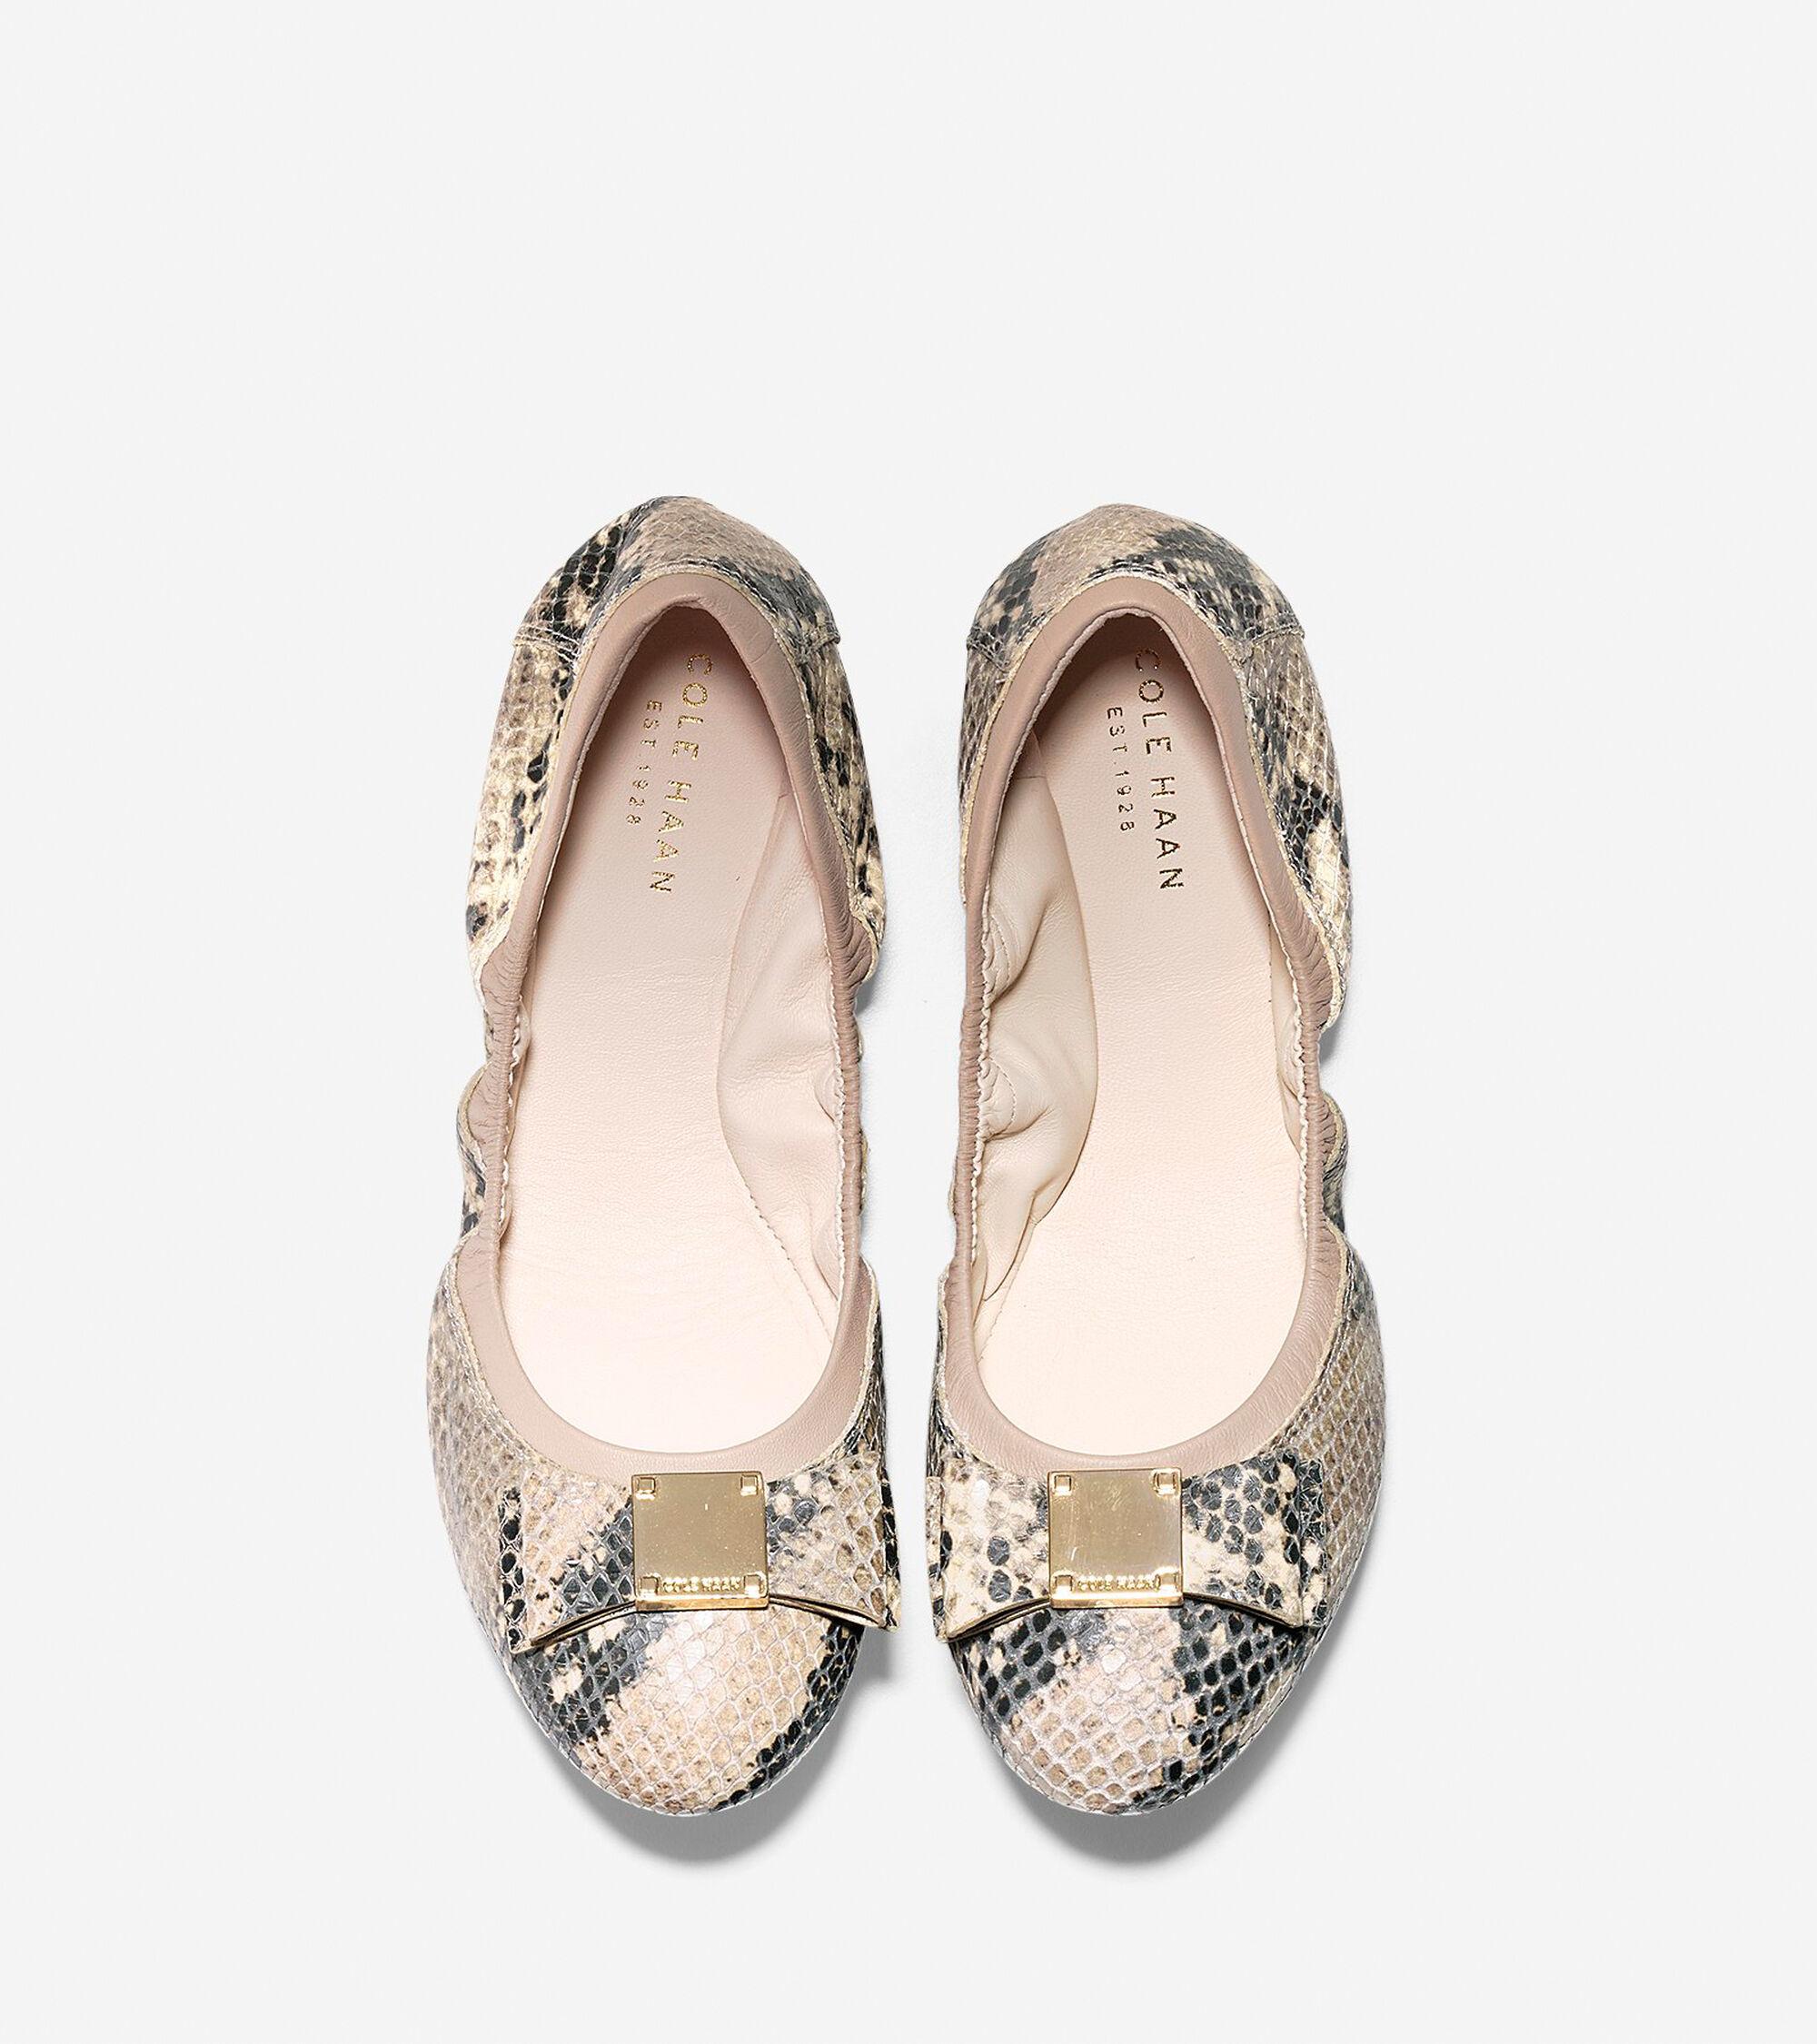 906531b9369 Women s Tali Bow Ballet Flats in Roccia Snake Print